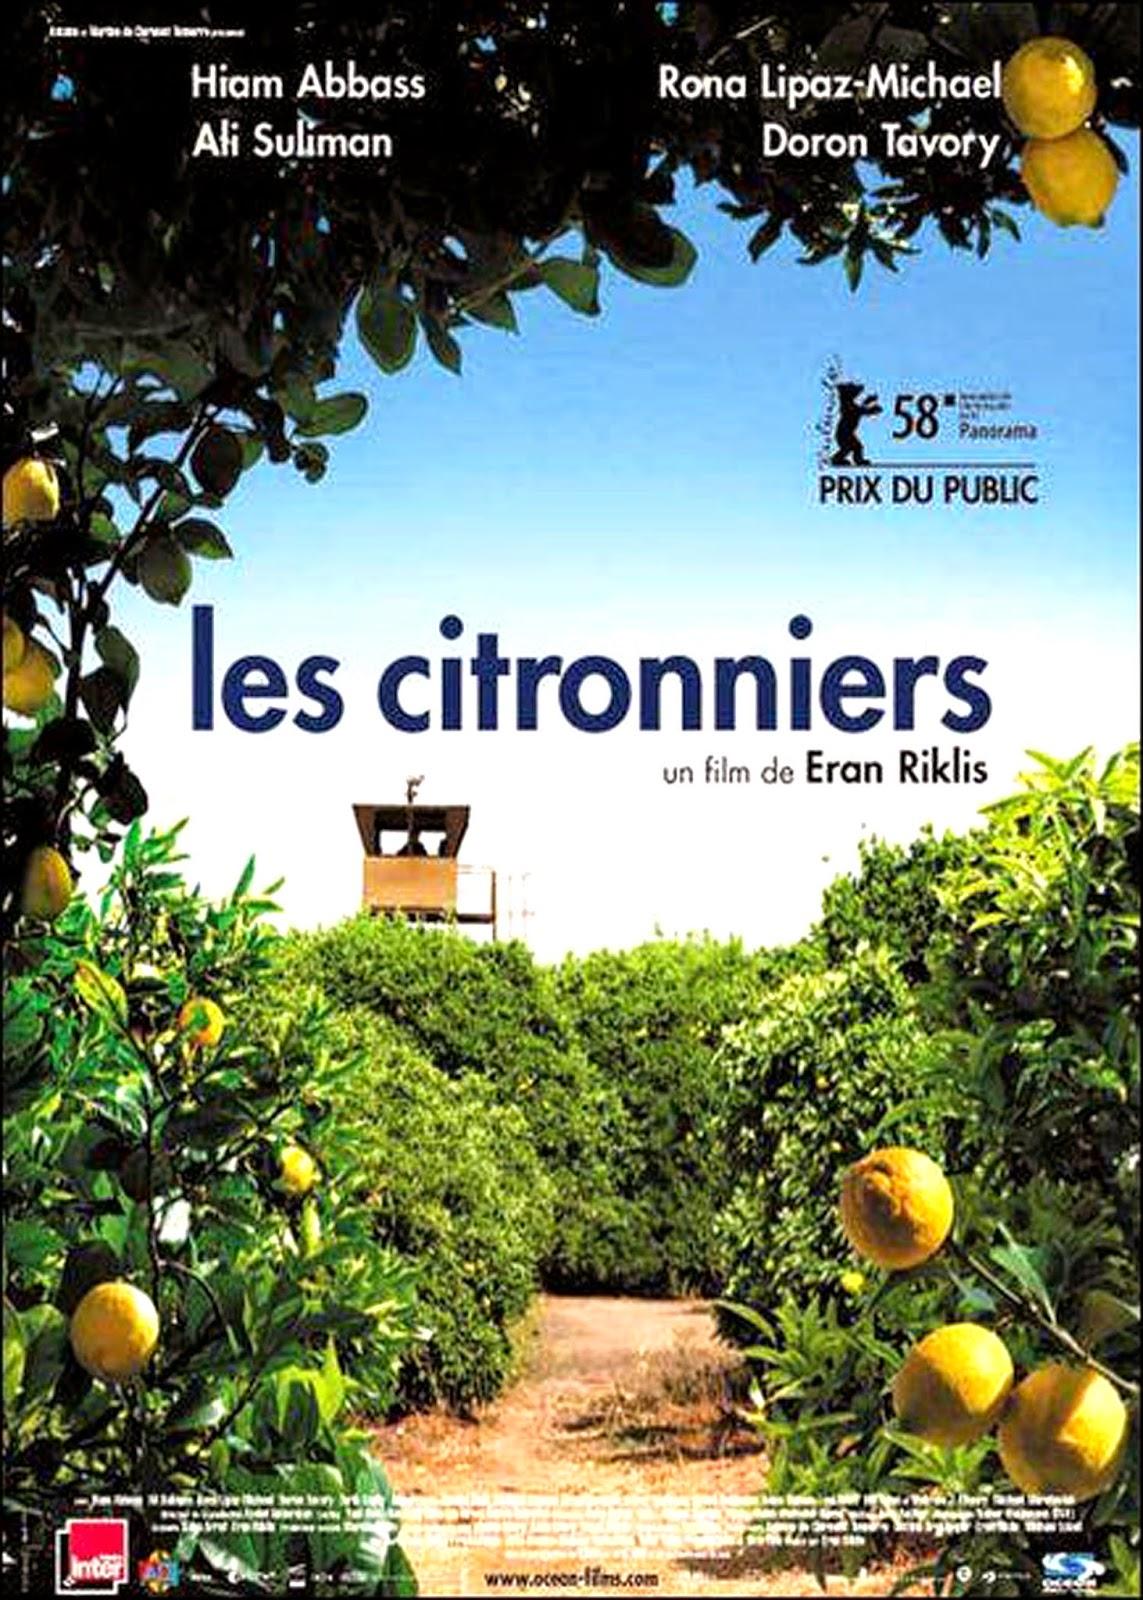 Los limoneros (2008) Drama